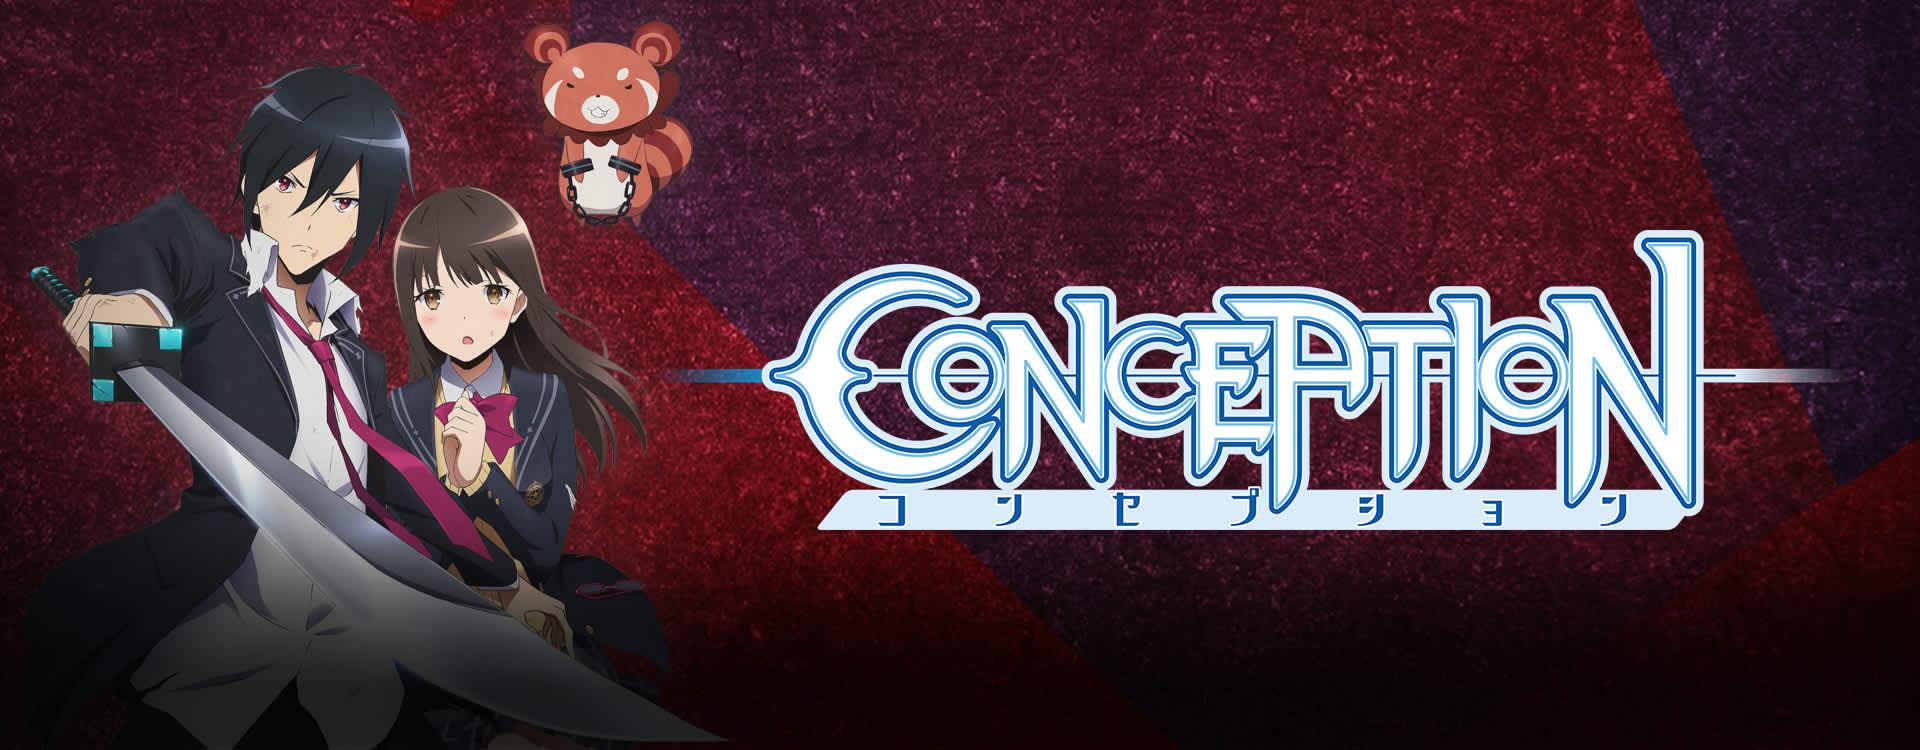 Watch Conception Episodes Dub Actionadventure Fantasy Anime